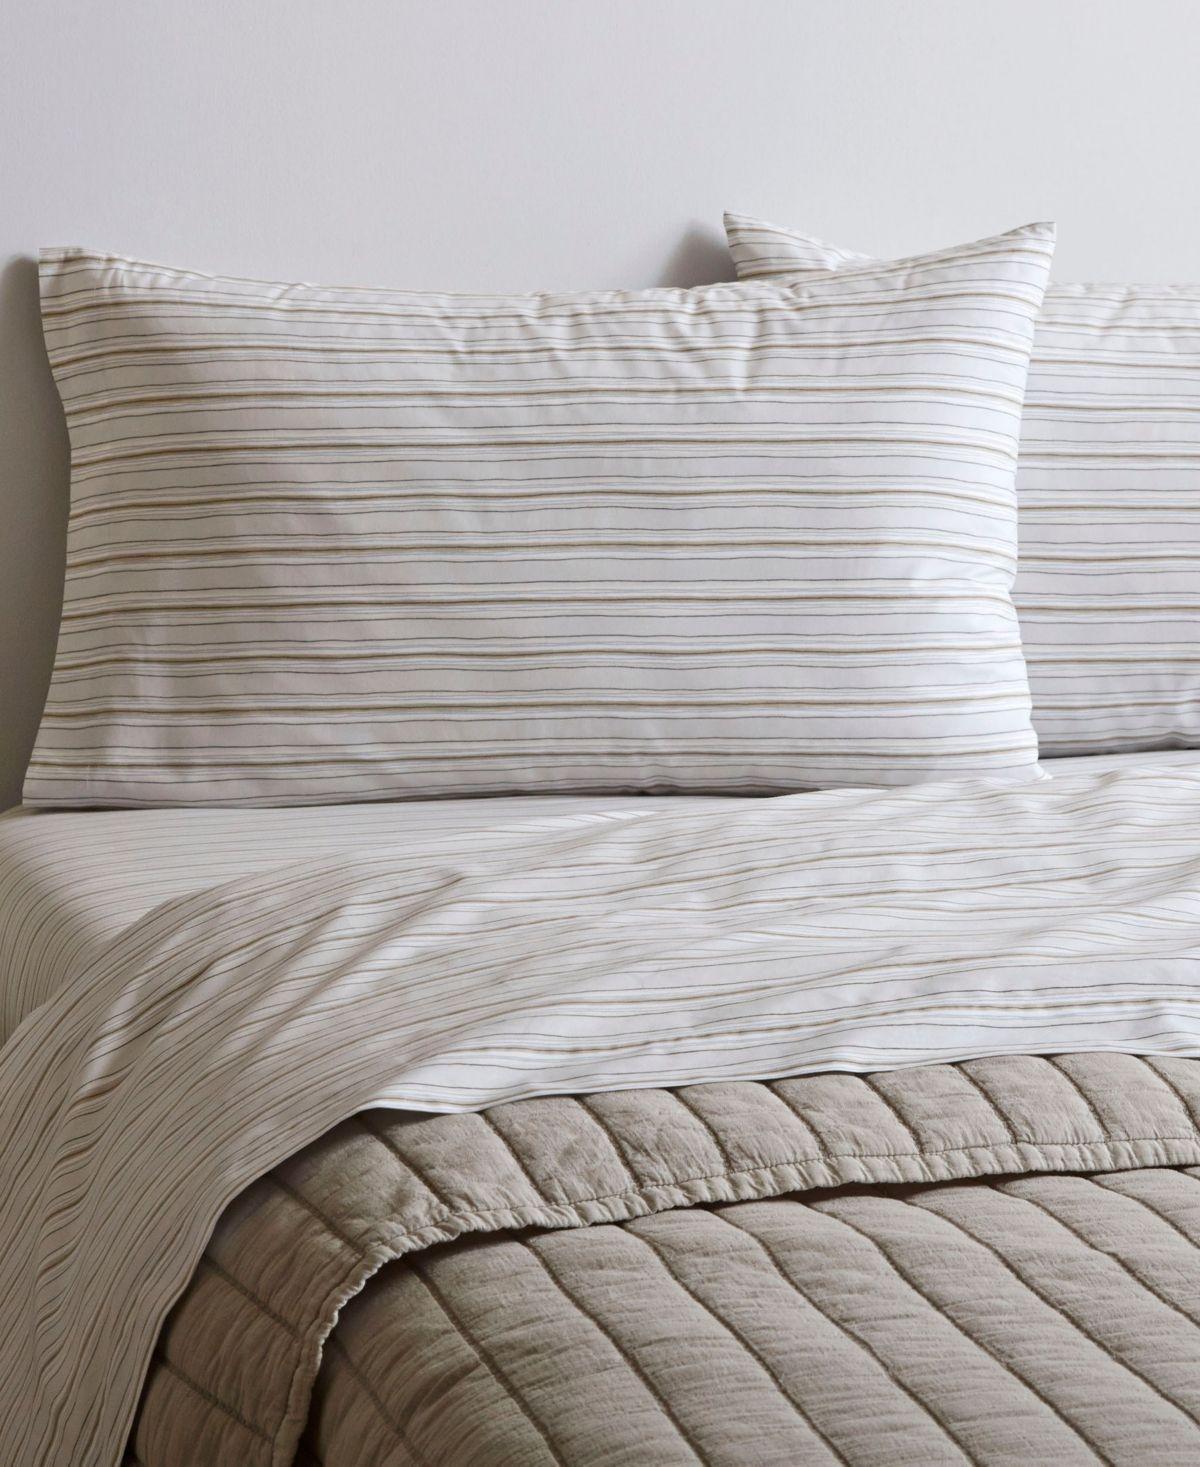 Ed Ellen Degeneres Printed Cotton Percale Twin Sheet Set Reviews Home Macy S Striped Sheets King Sheet Sets Mattress Furniture